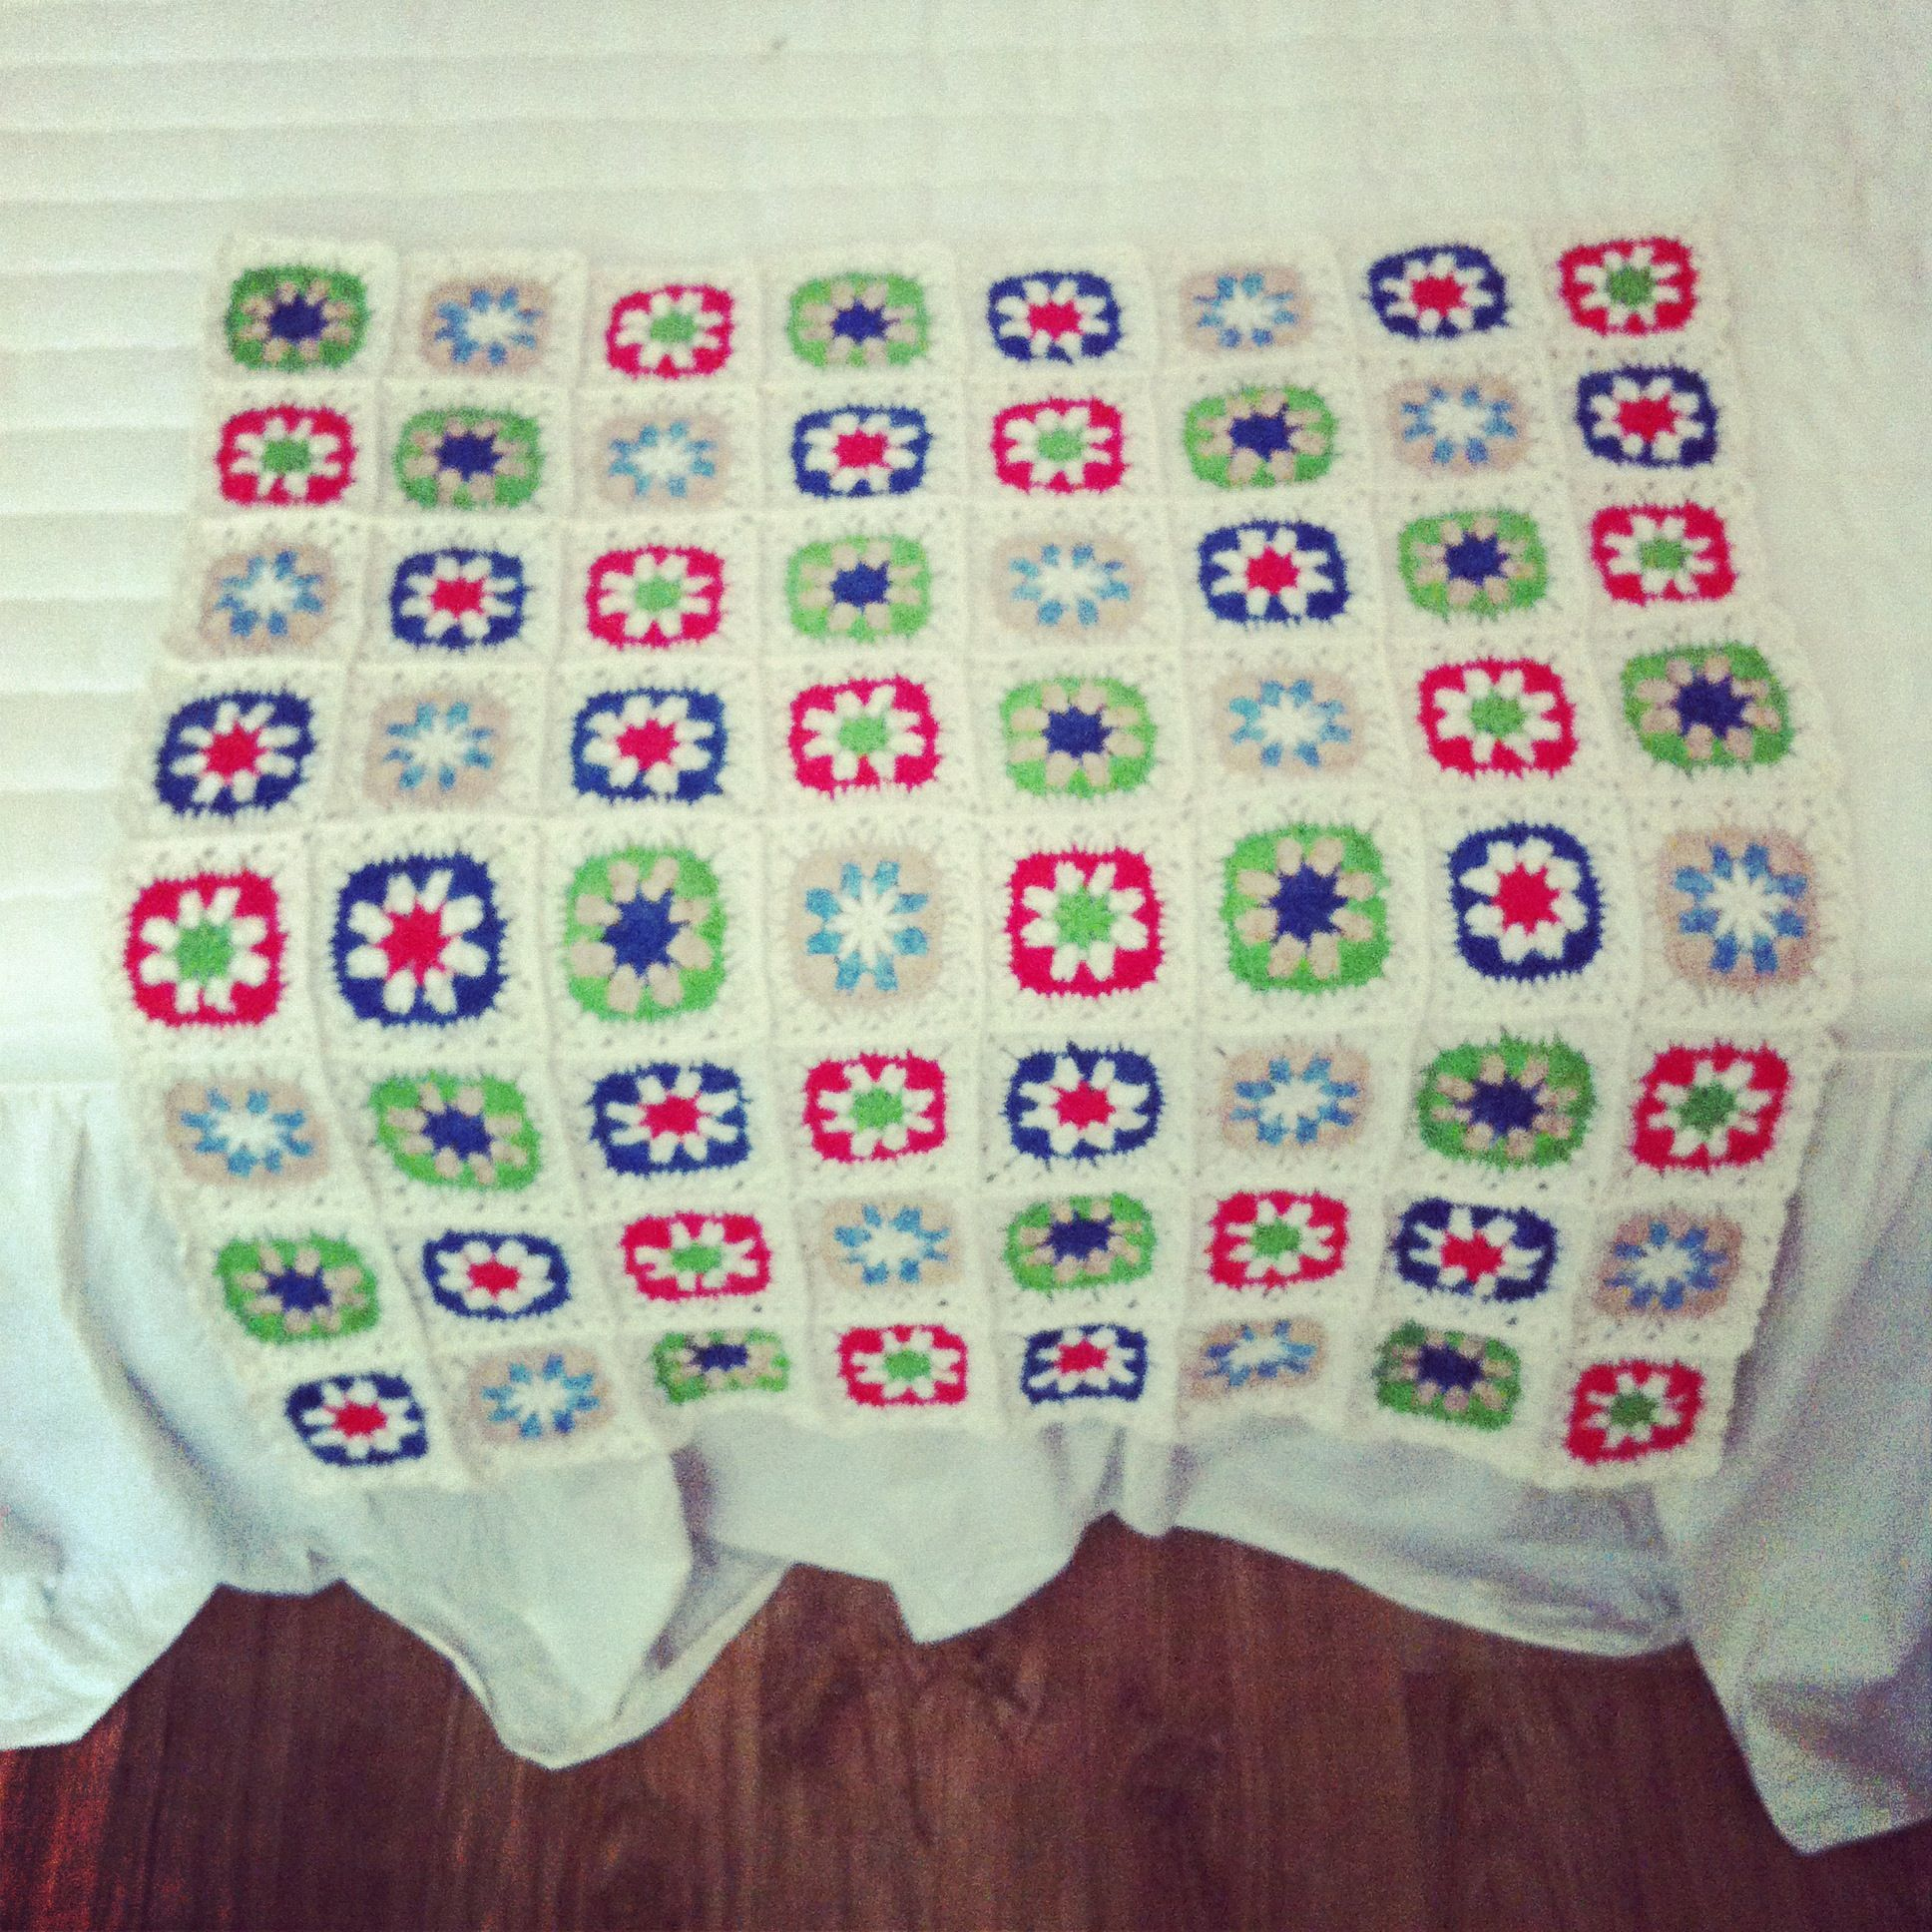 motif blanket for my nephew...불규칙적인배치!음!